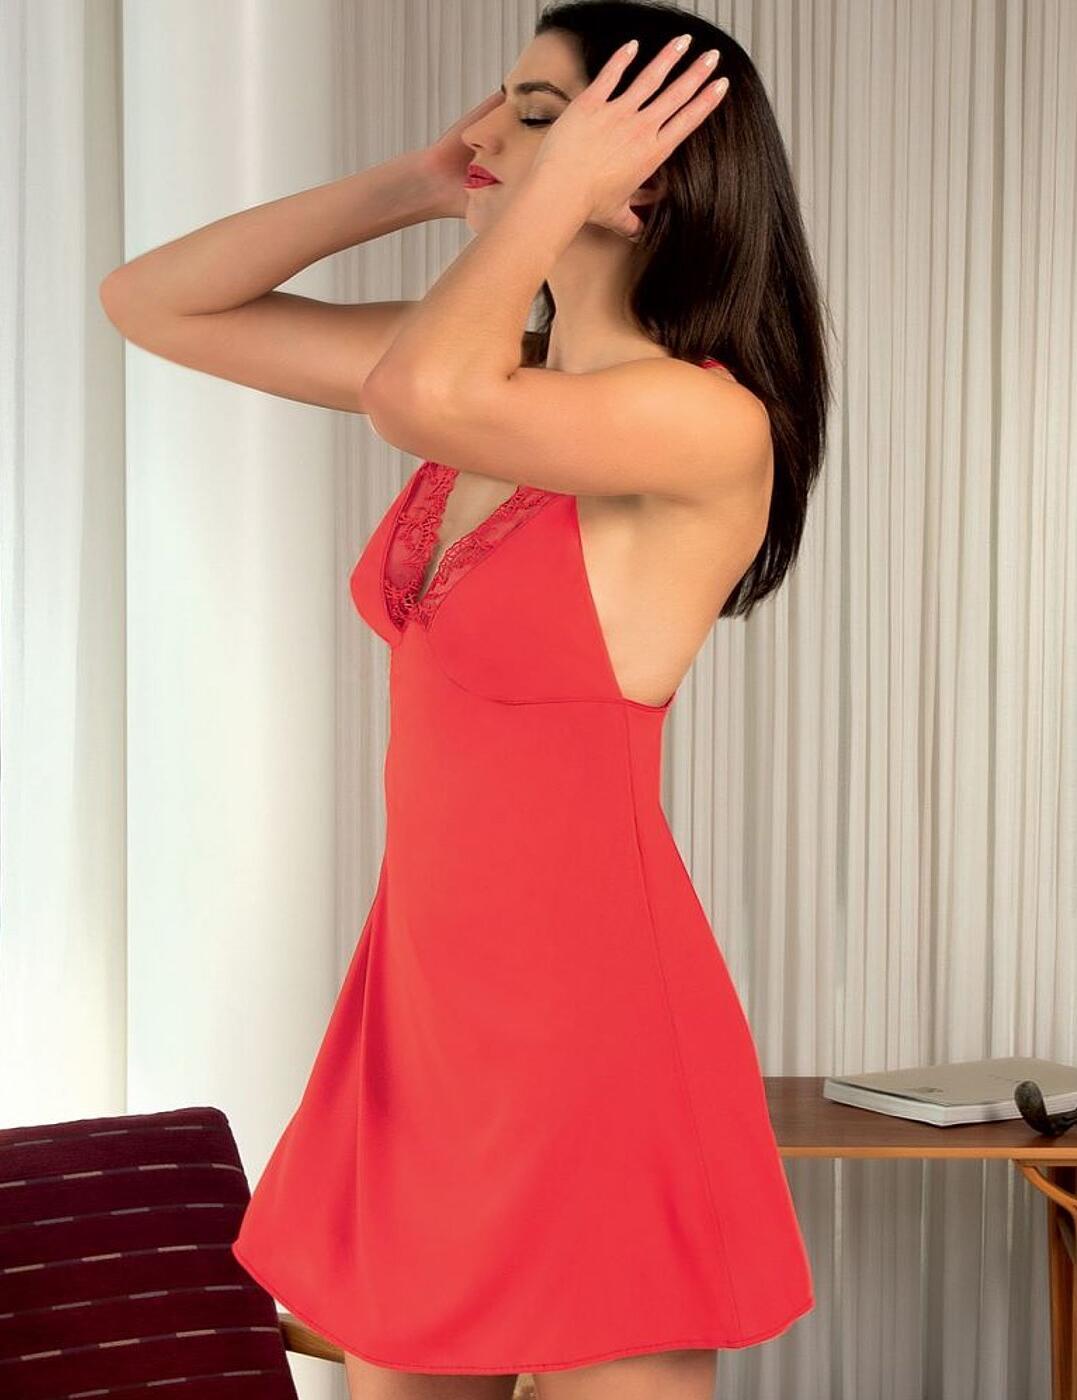 Lise Charmel Charme Futur Sexy Nightdress Rouge